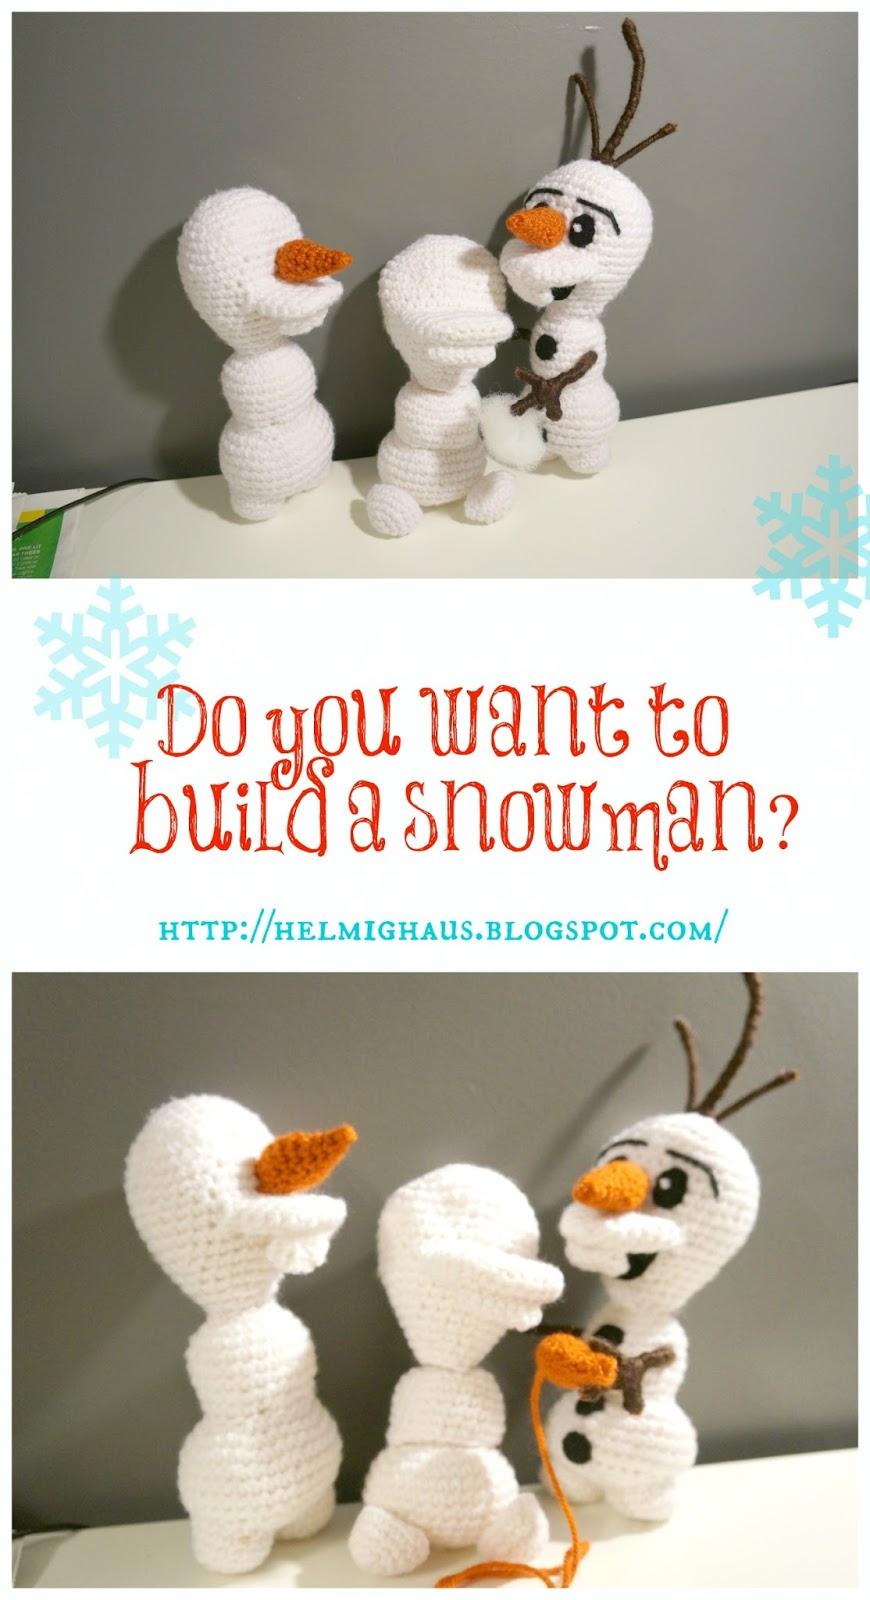 Amigurumi Olaf Tutorial : HelmigHaus: Disneys Frozen Inspired Olaf Amigurumi Doll